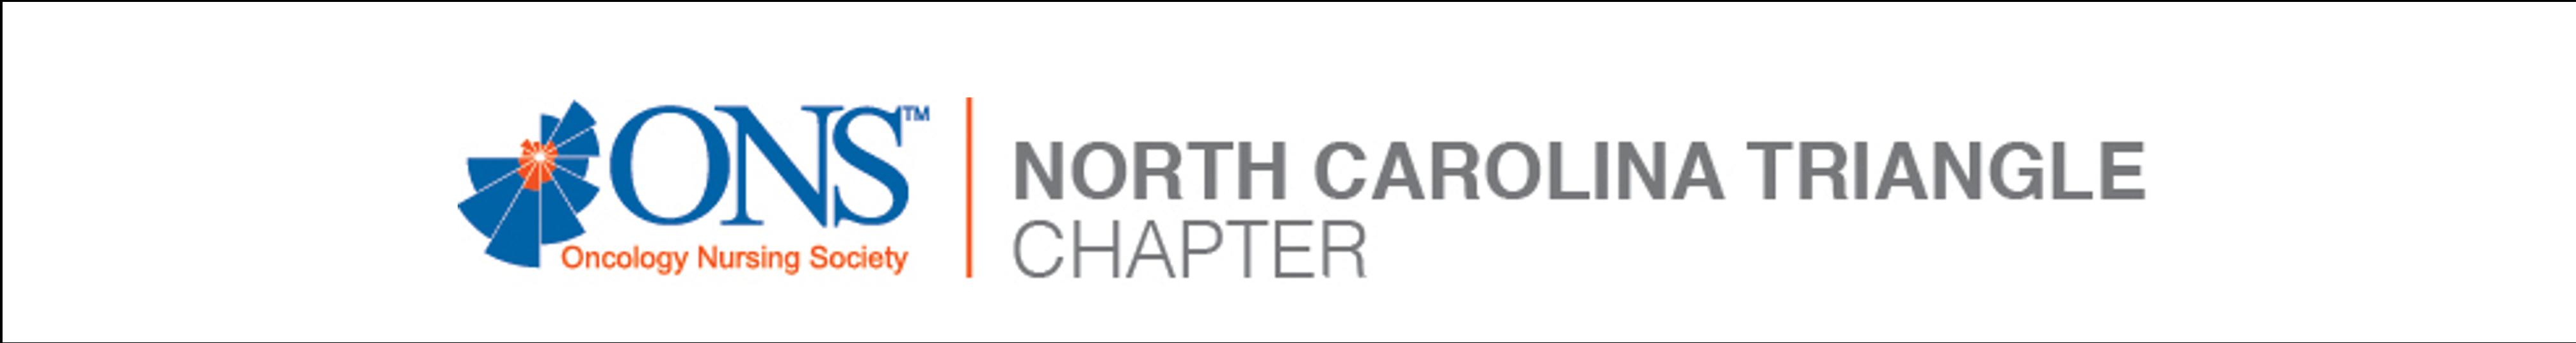 NorthCarolinaTriangle